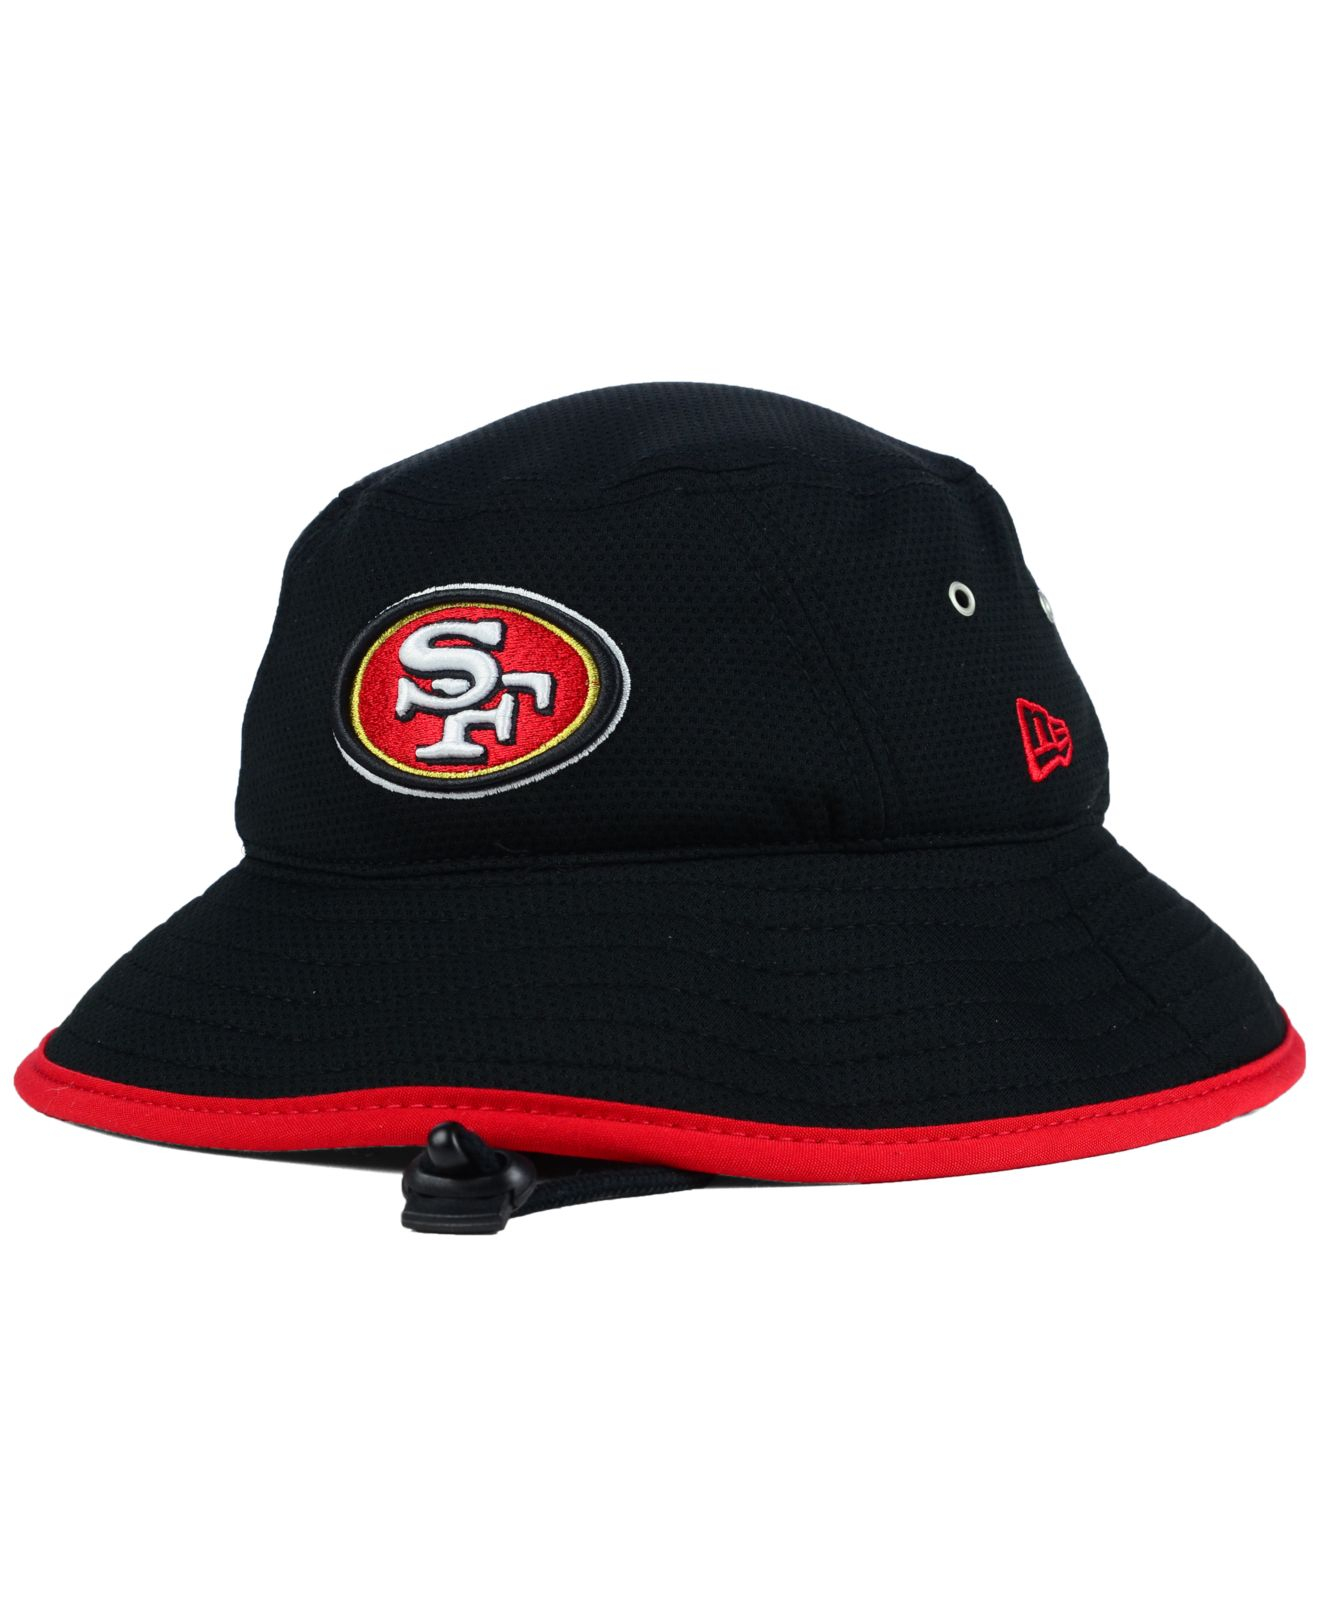 Lyst - KTZ San Francisco 49ers Training Bucket Hat in Black for Men 9bc9caa43e7